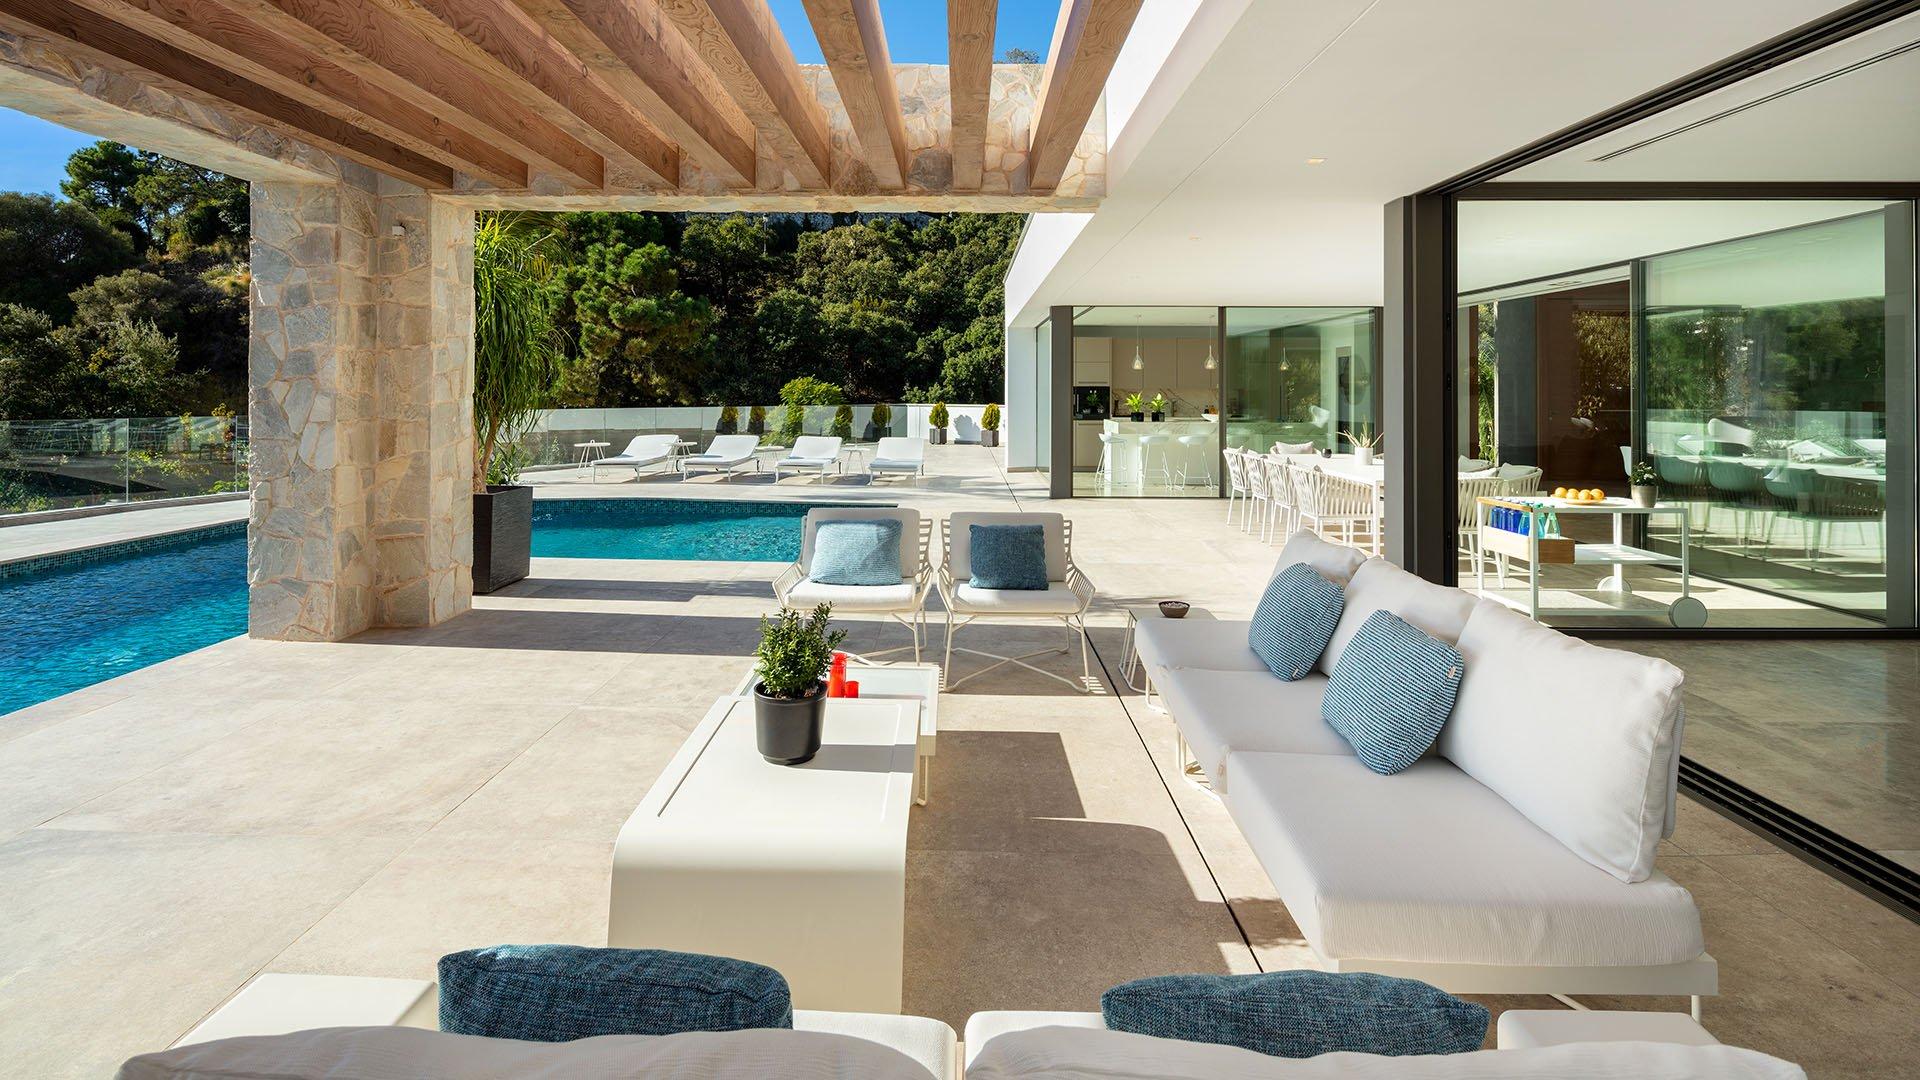 Villa Lupi: Magnificent villa in La Quinta, Marbella